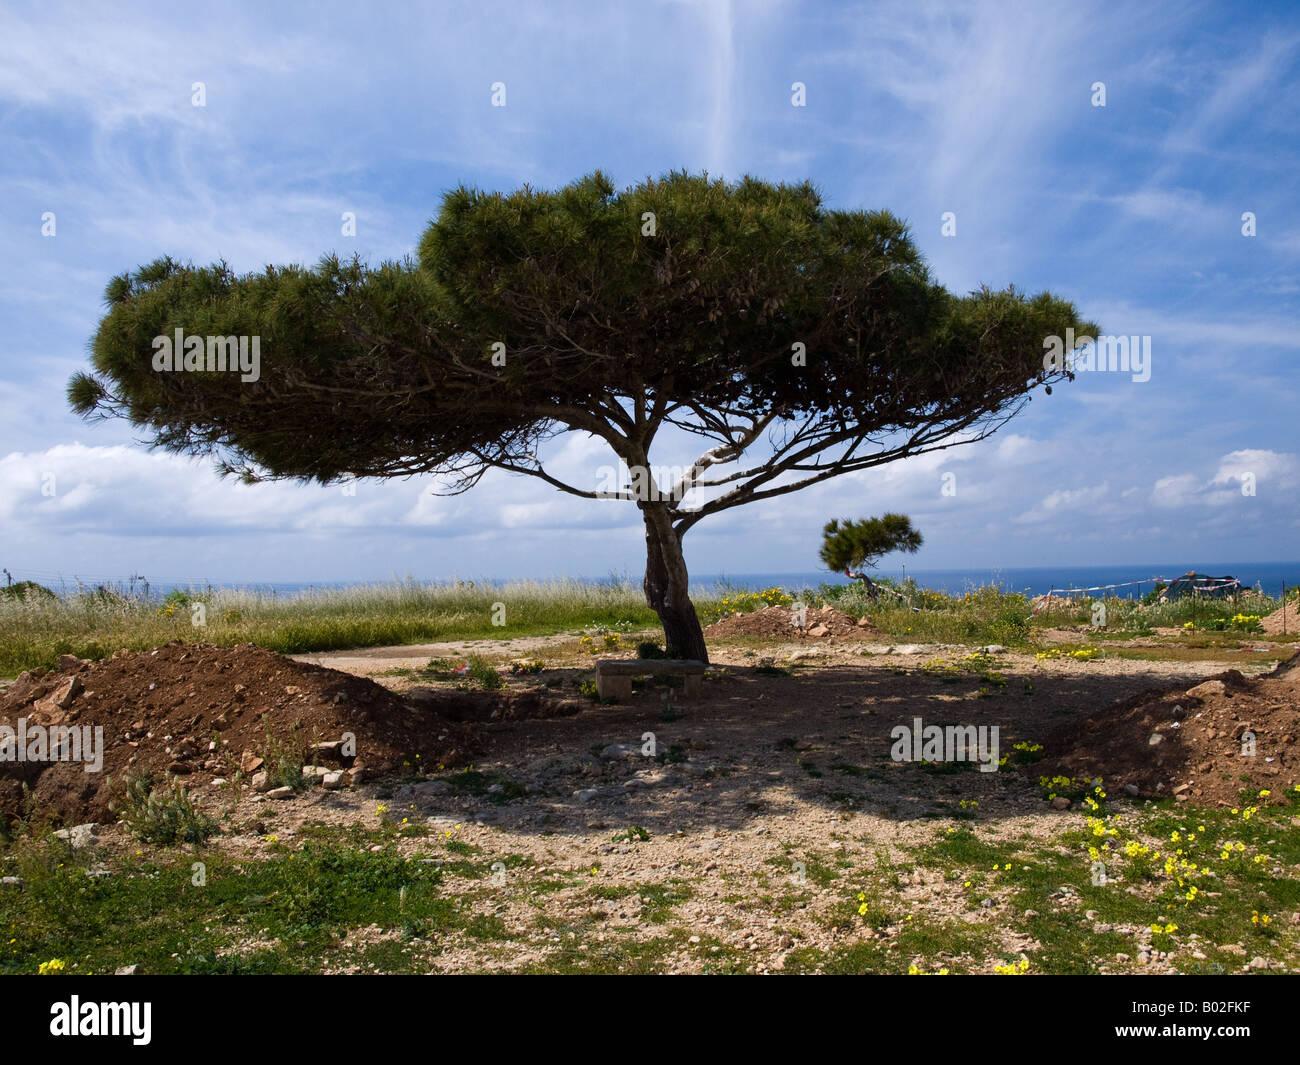 A distinctive Aleppo Pine grows in southern Malta. - Stock Image